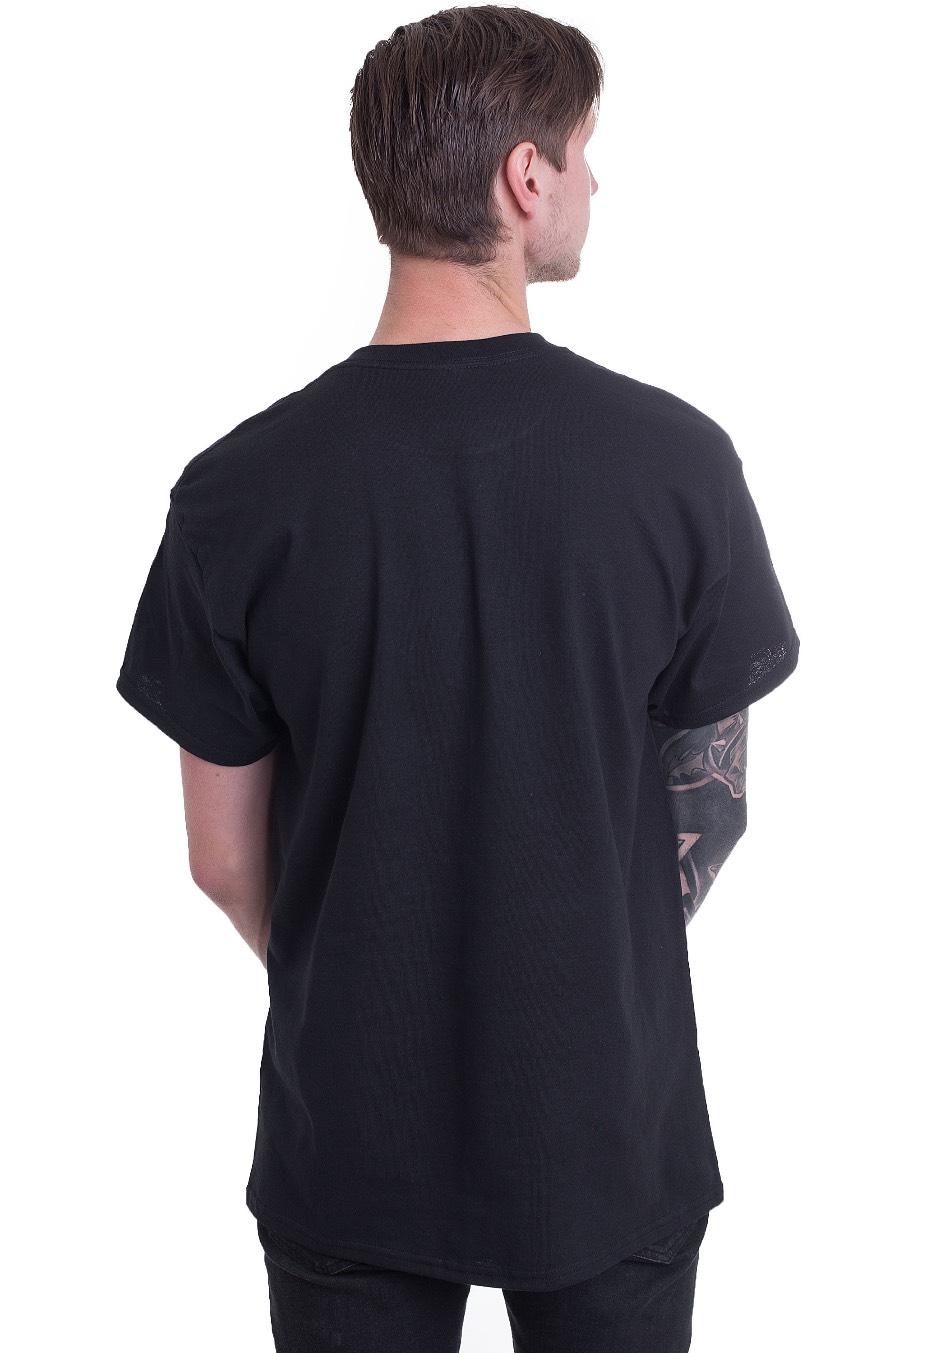 FIVE FINGER DEATH PUNCH t-shirt SPIRAL Assassin Homme Noir